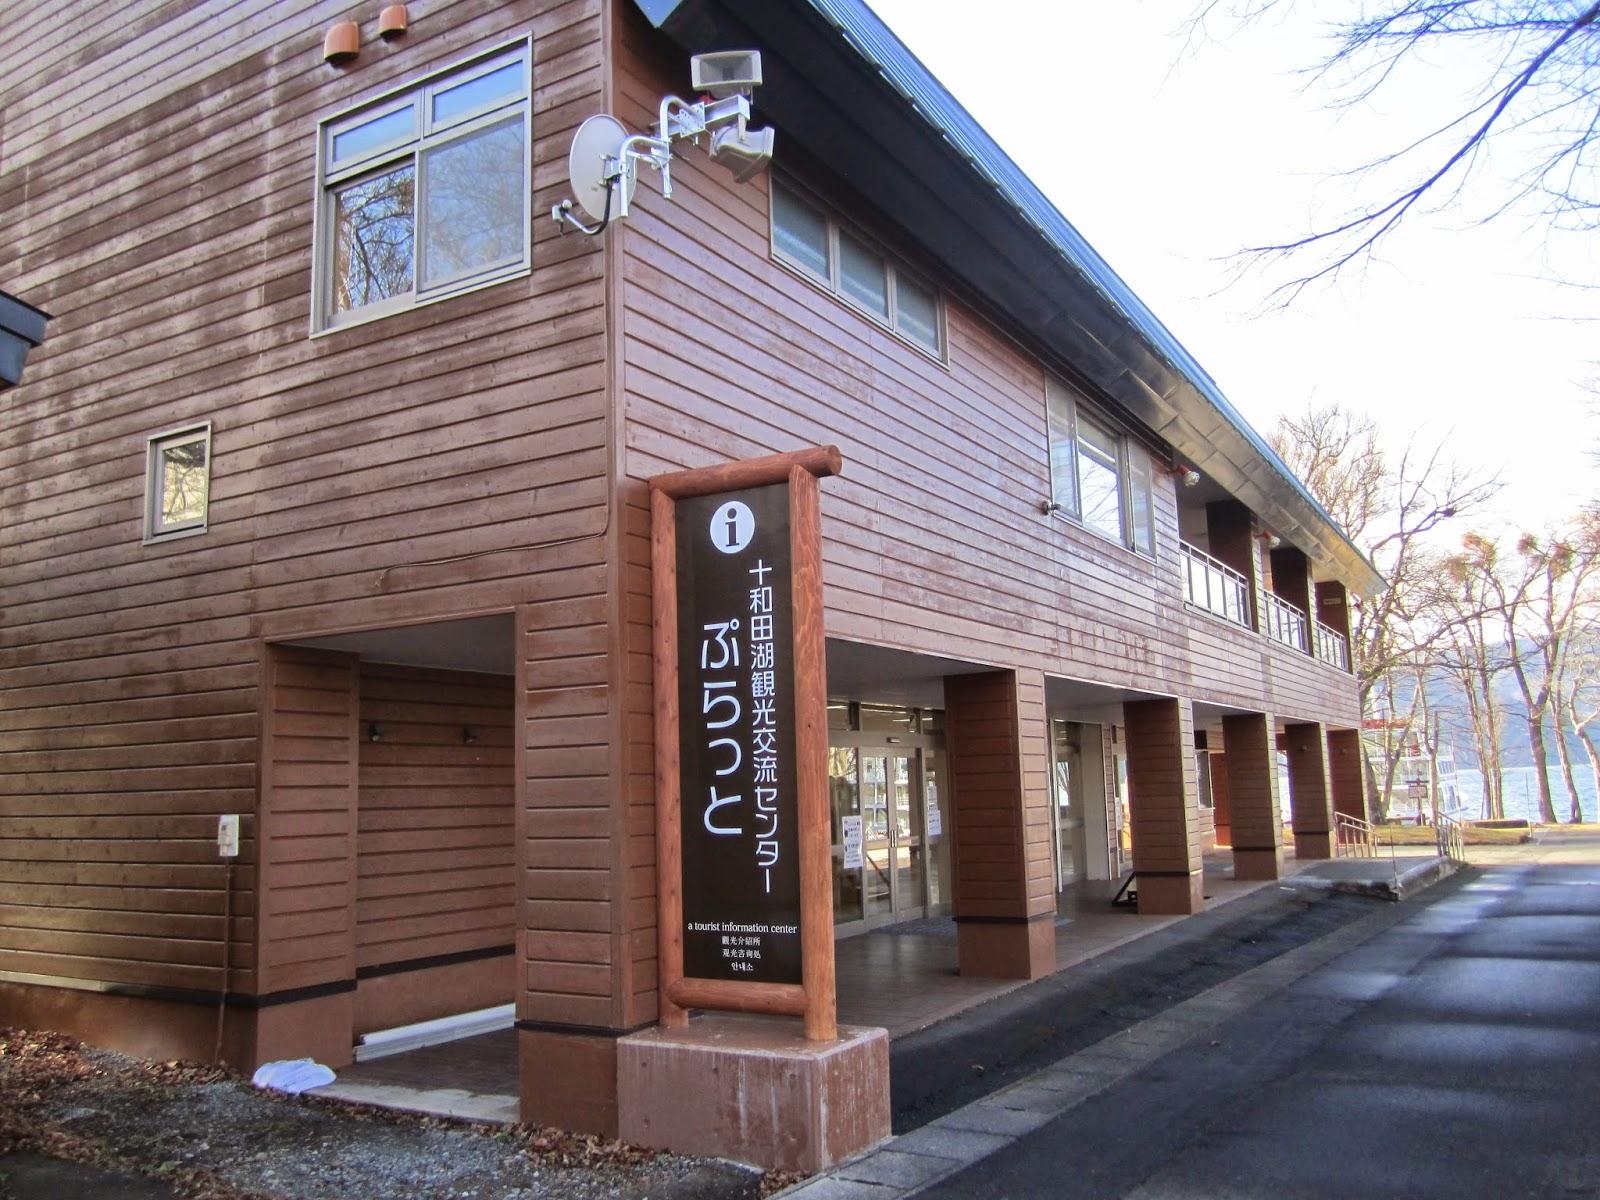 Lake Towada Tourist Center Puratto 十和田市十和田湖観光交流センターぷらっと